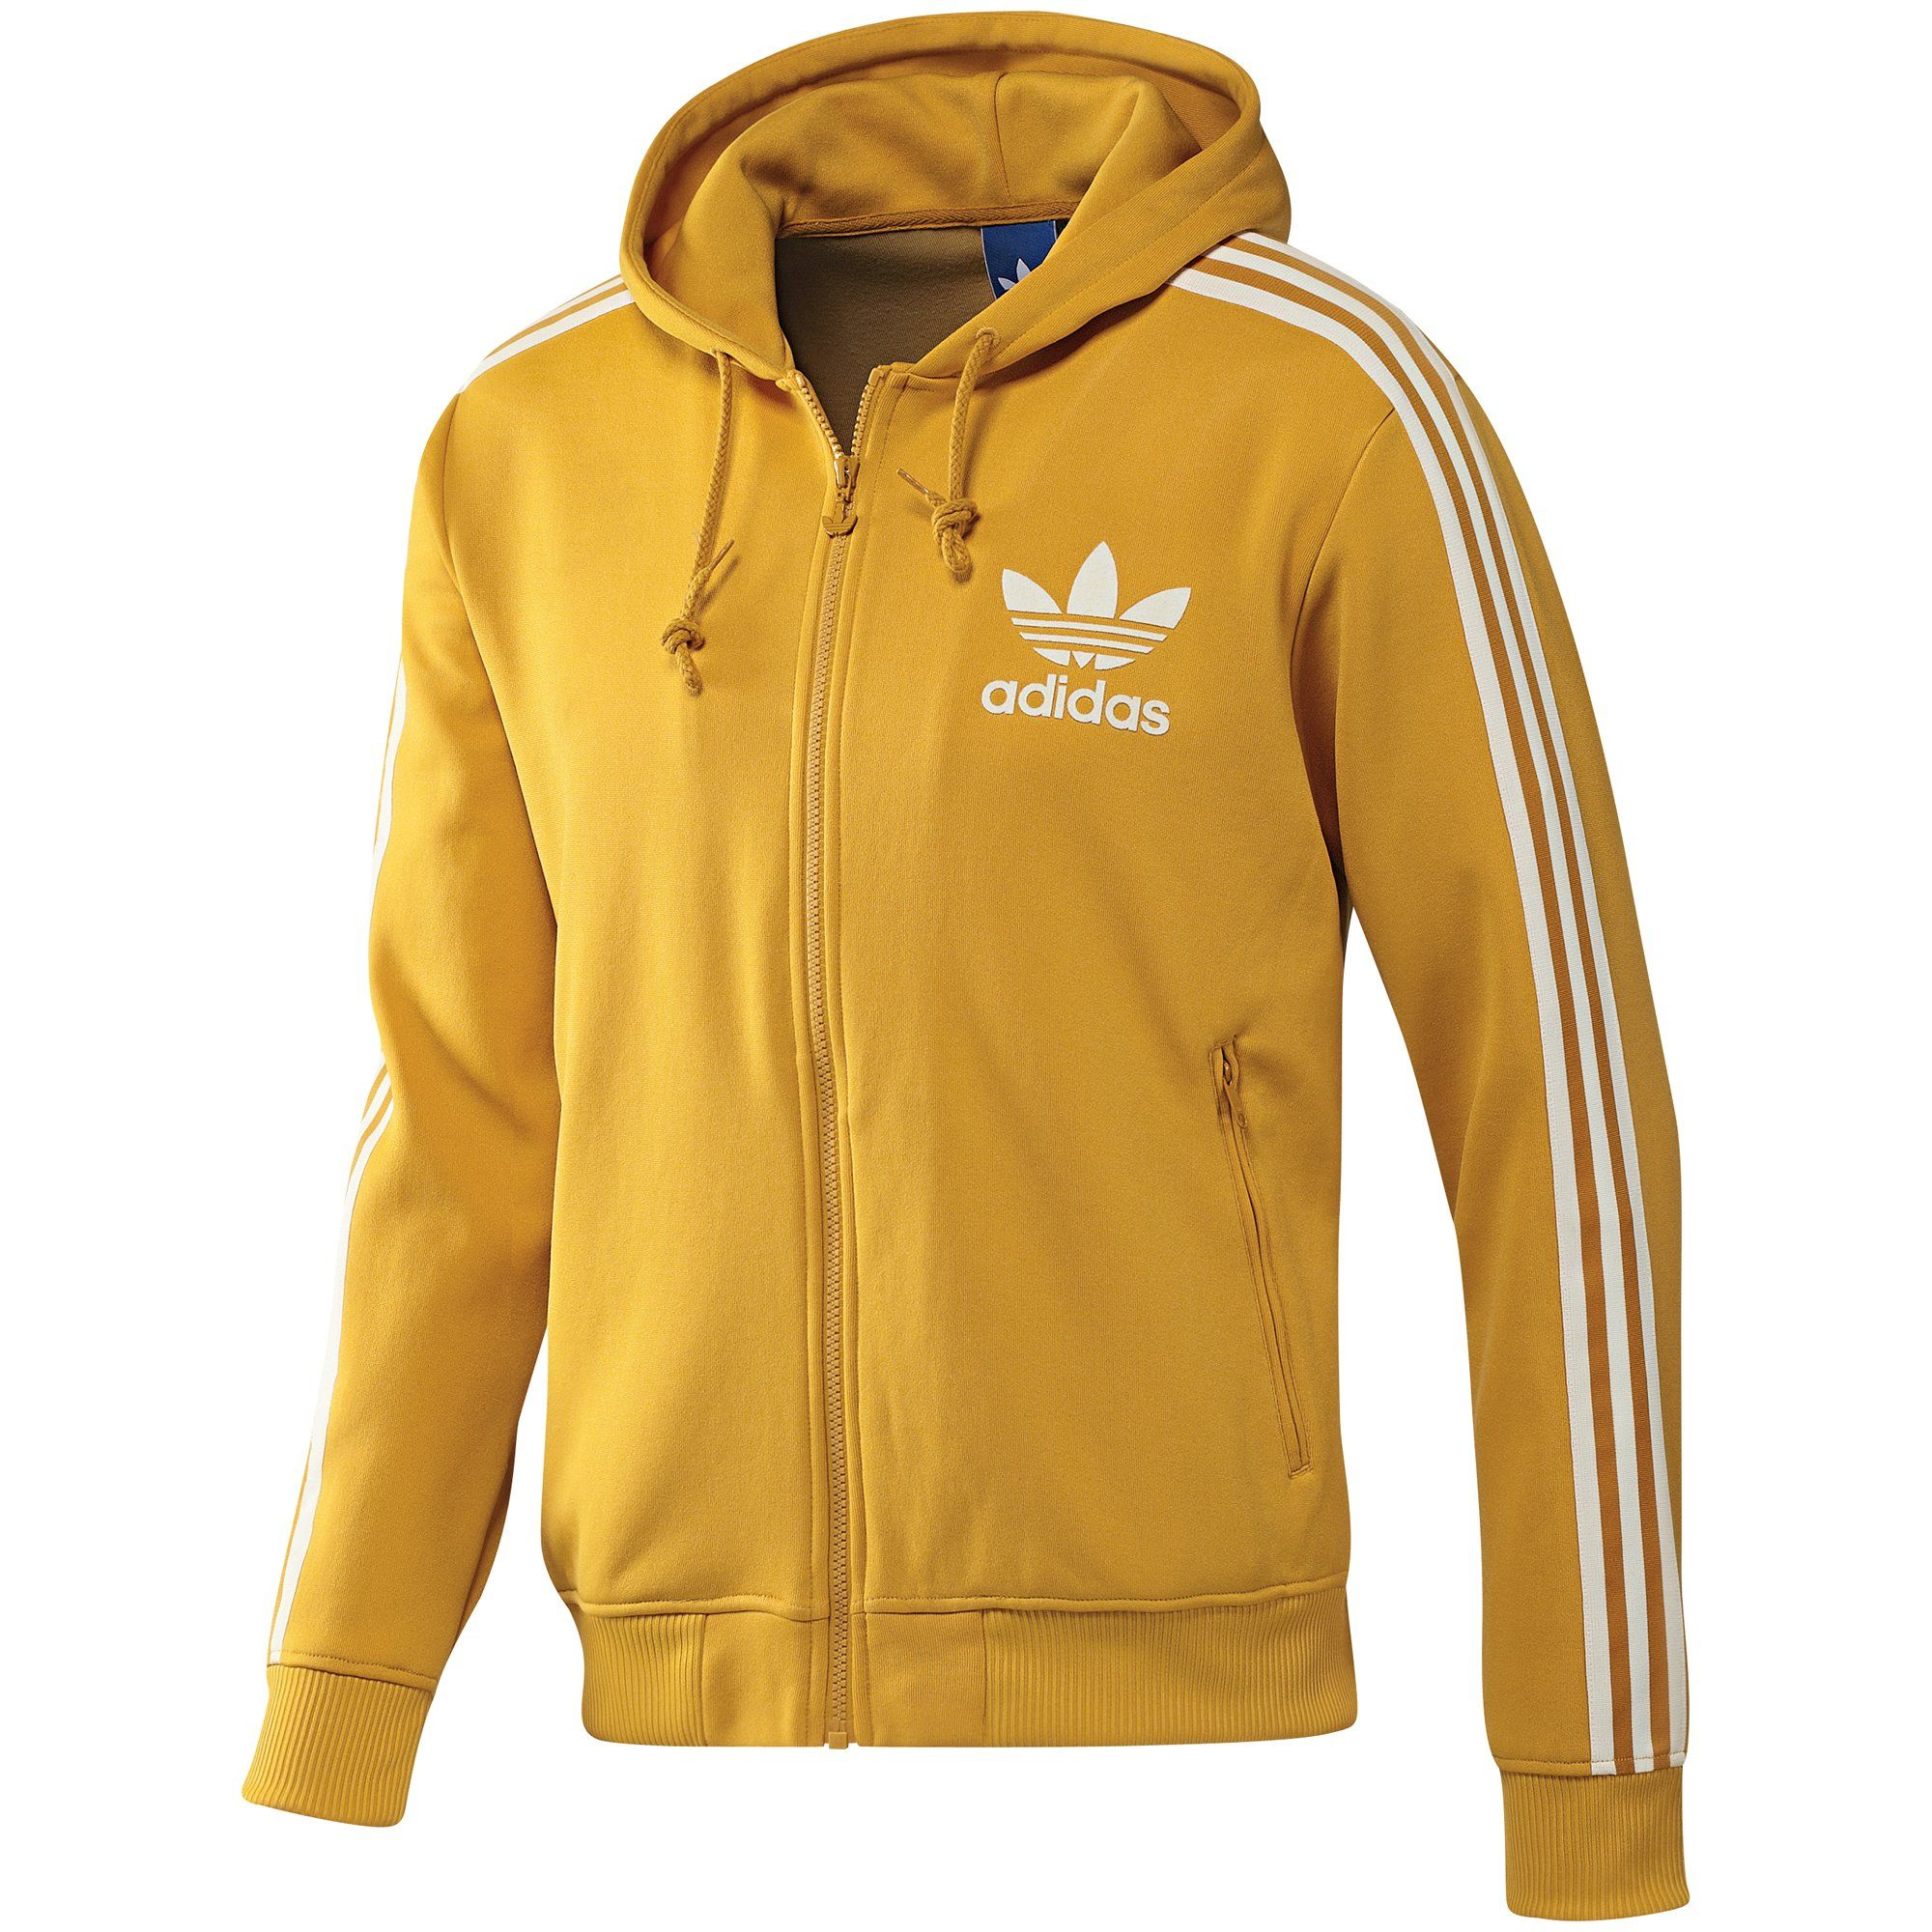 Chaqueta Adidas Original Yellow  d3fba803dde12